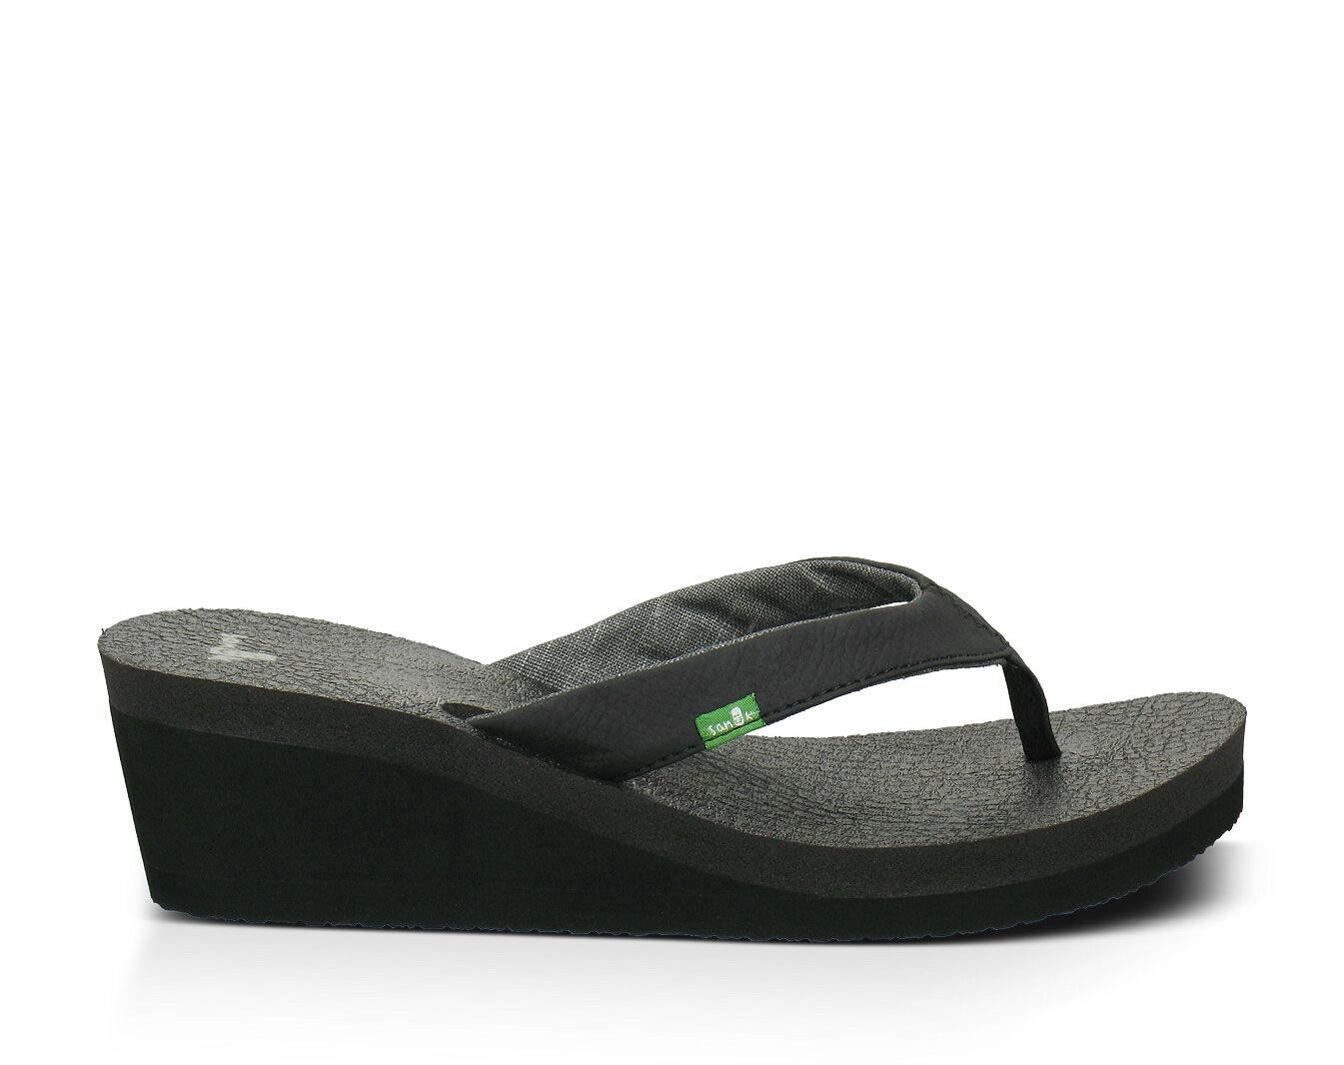 Sanuk Yoga Mat Wedge Sandals 4wVP07